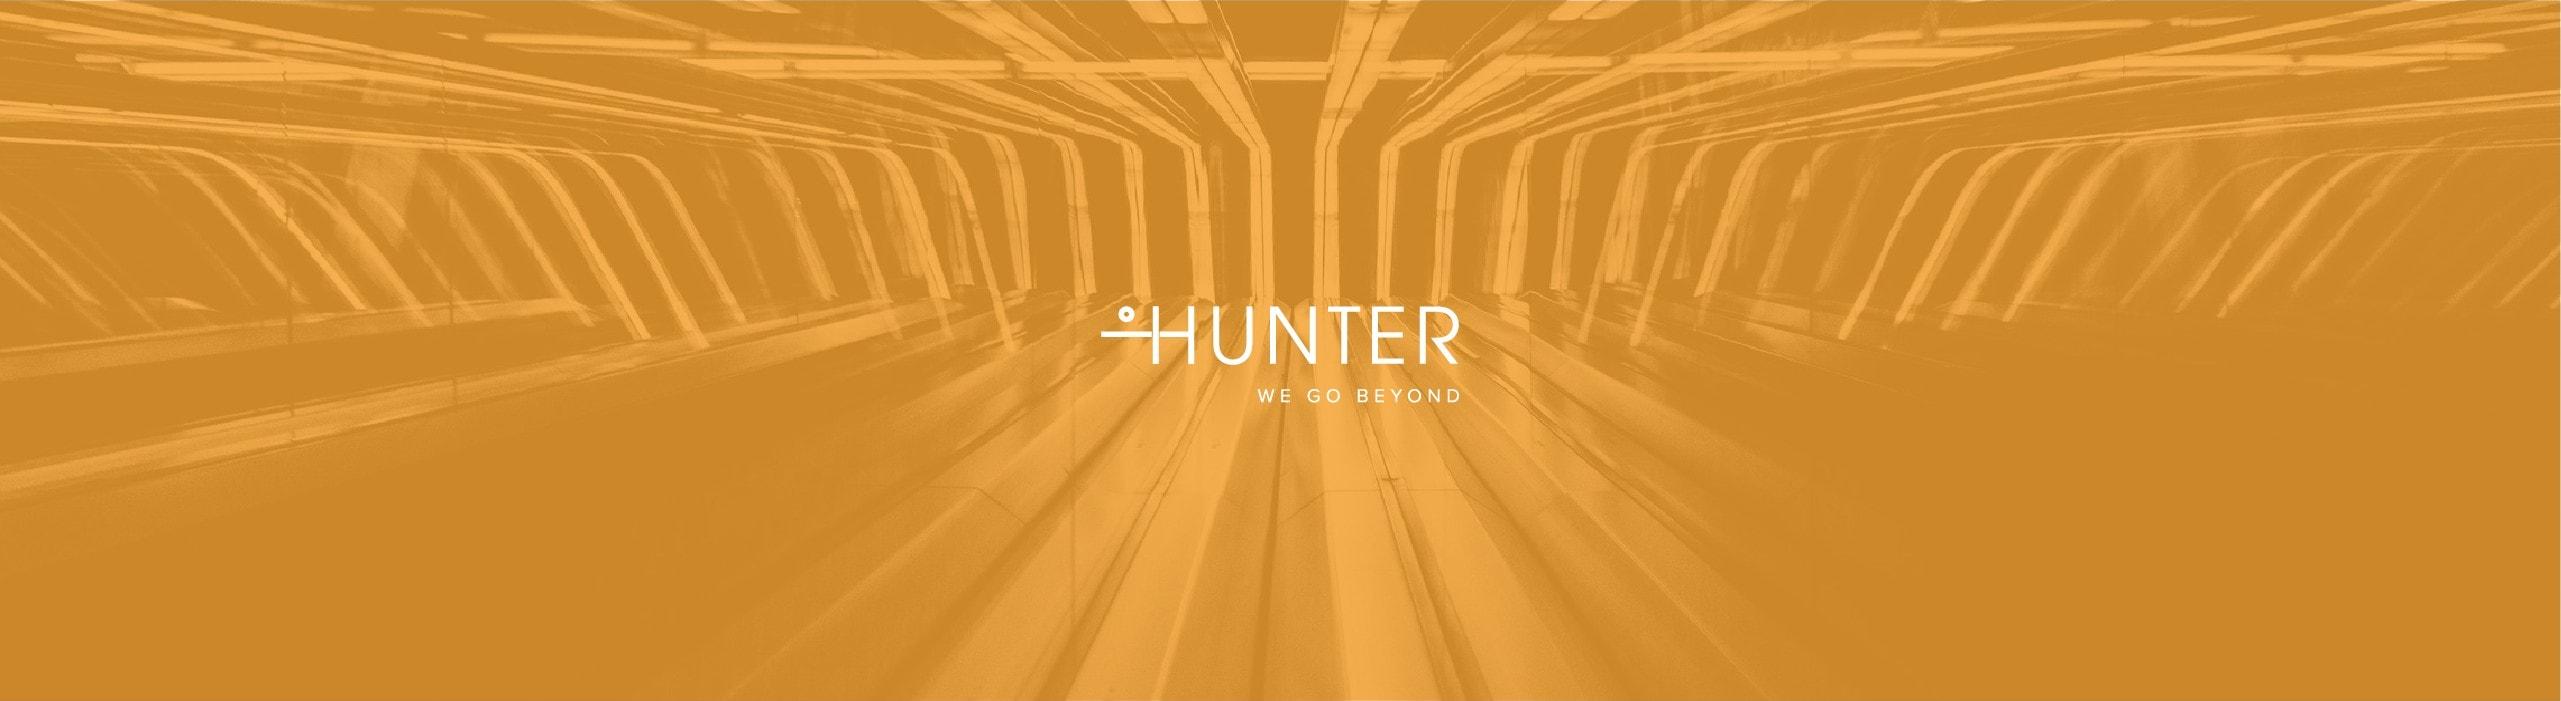 Hunter - 01 - Natie Branding Agency